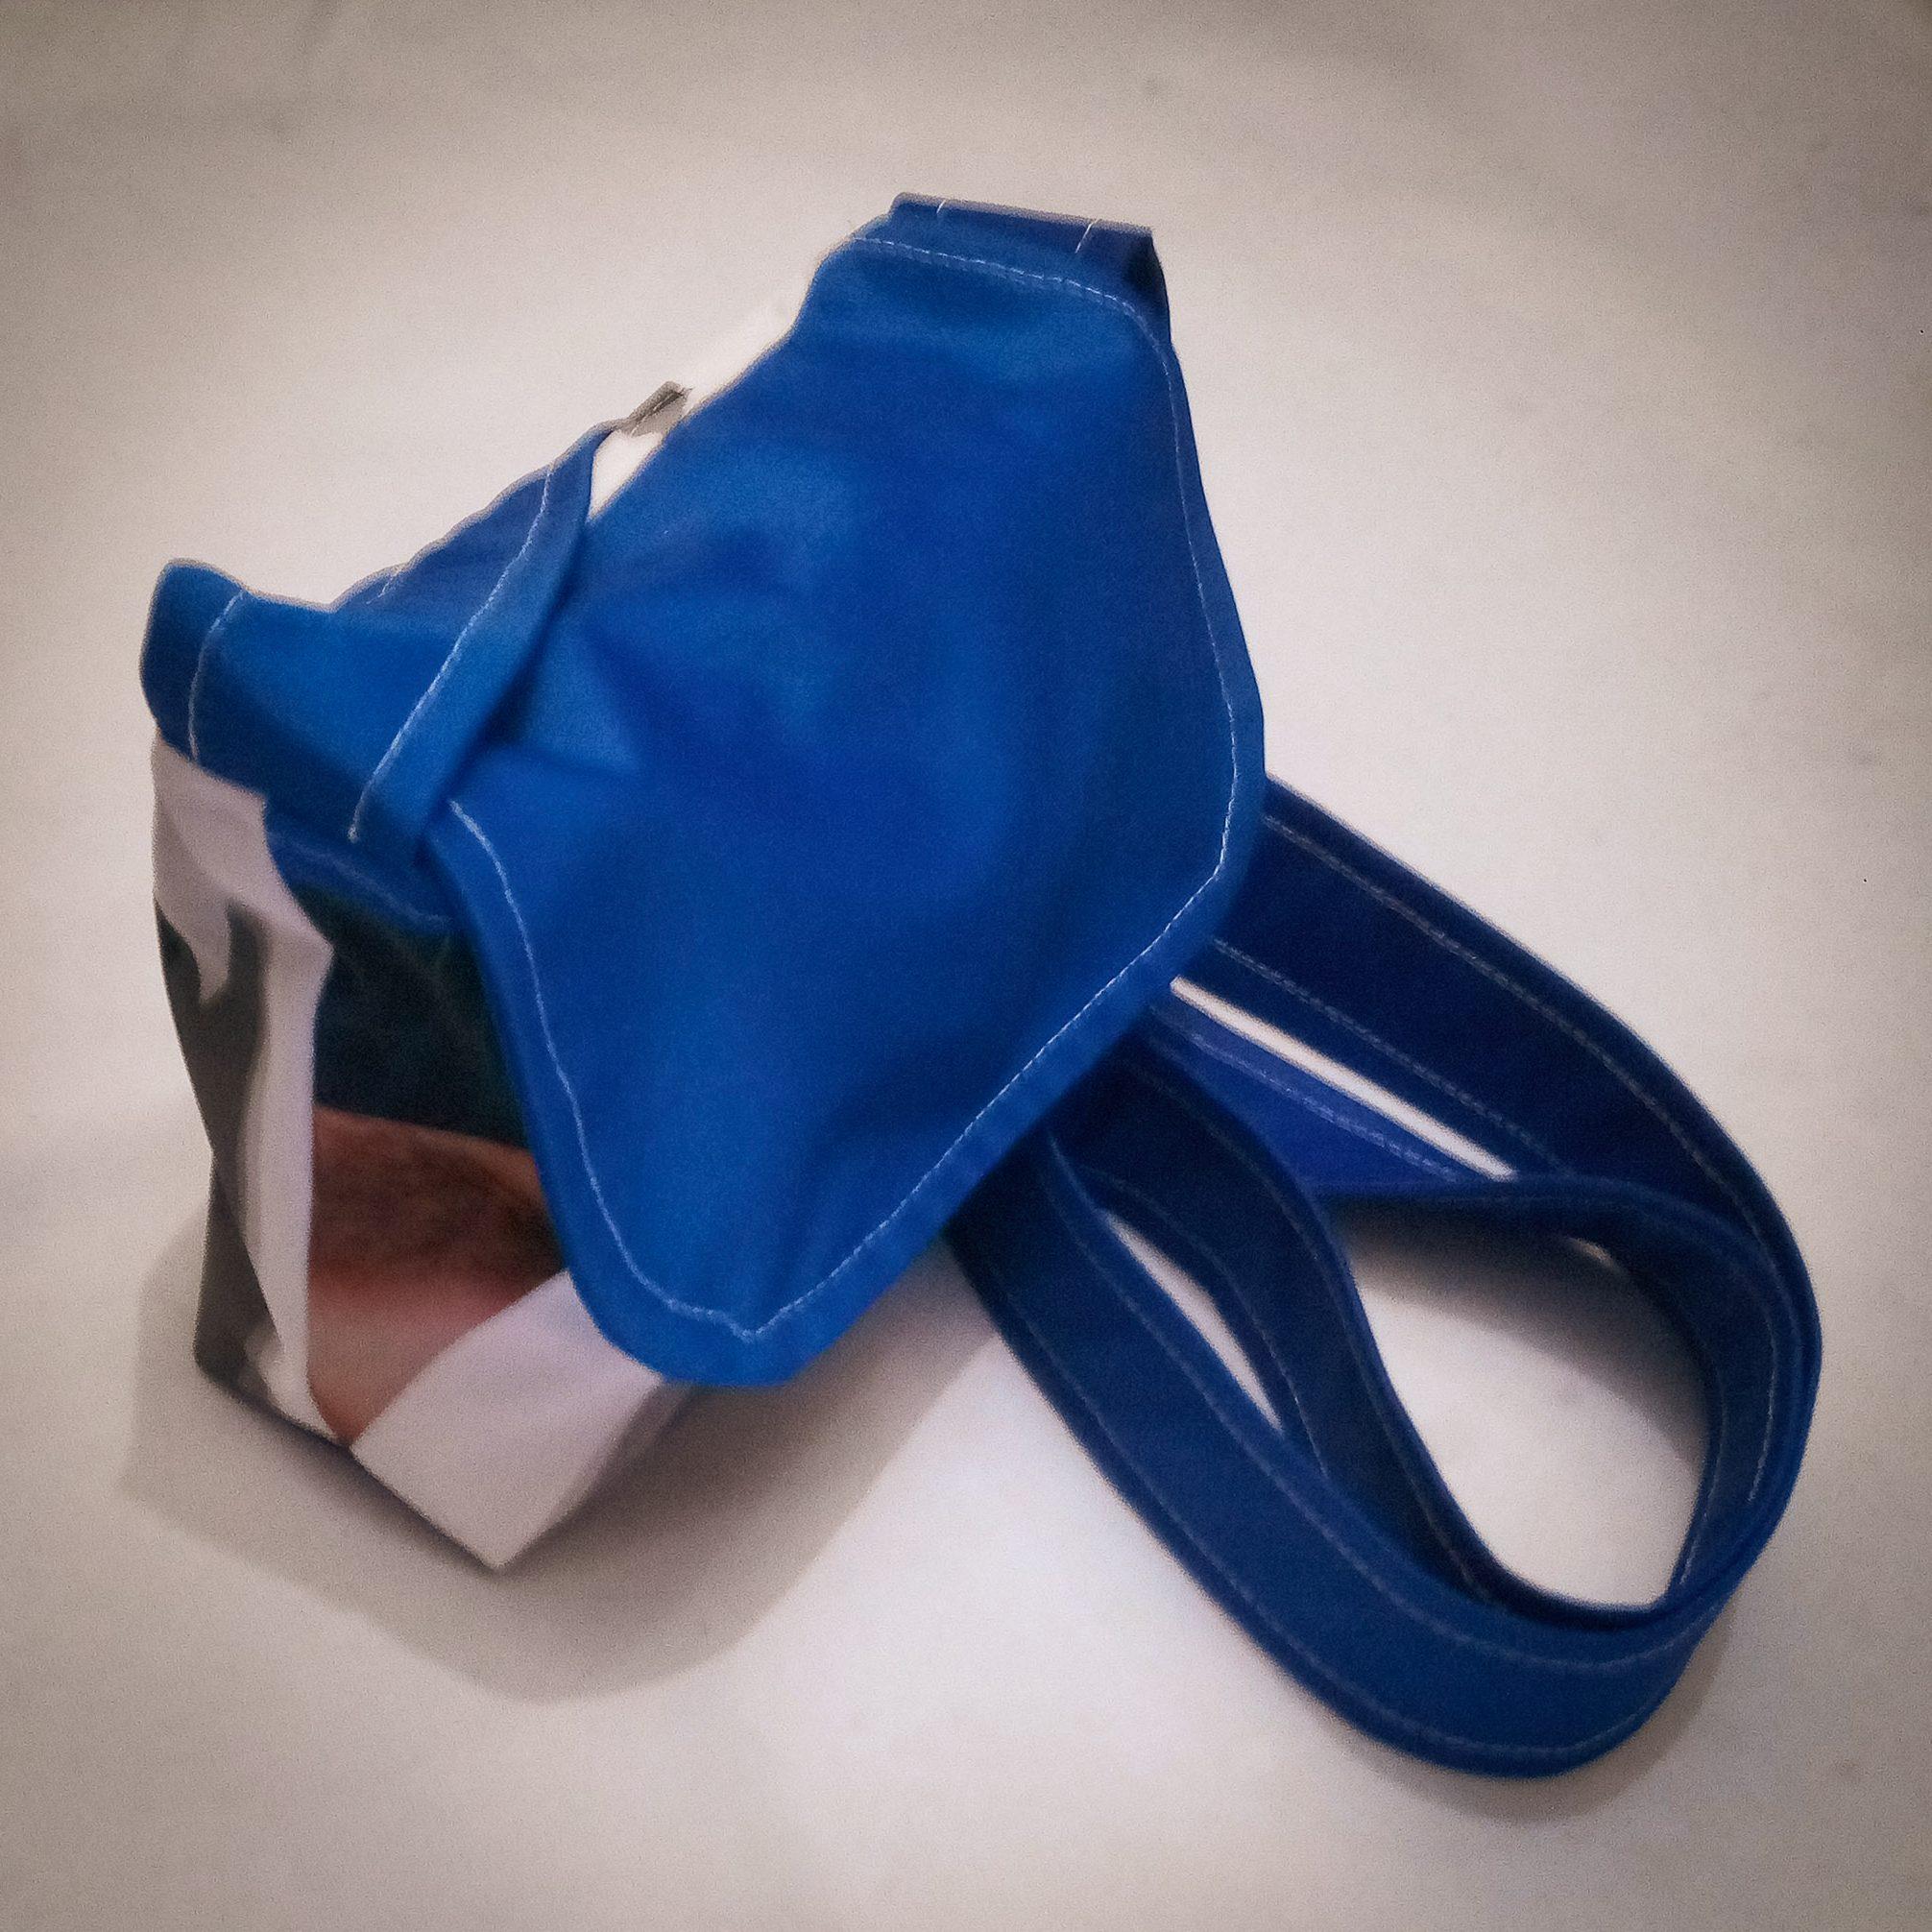 Handmade Fabric Cross Body Small Handbag, White, Black & Blue 2